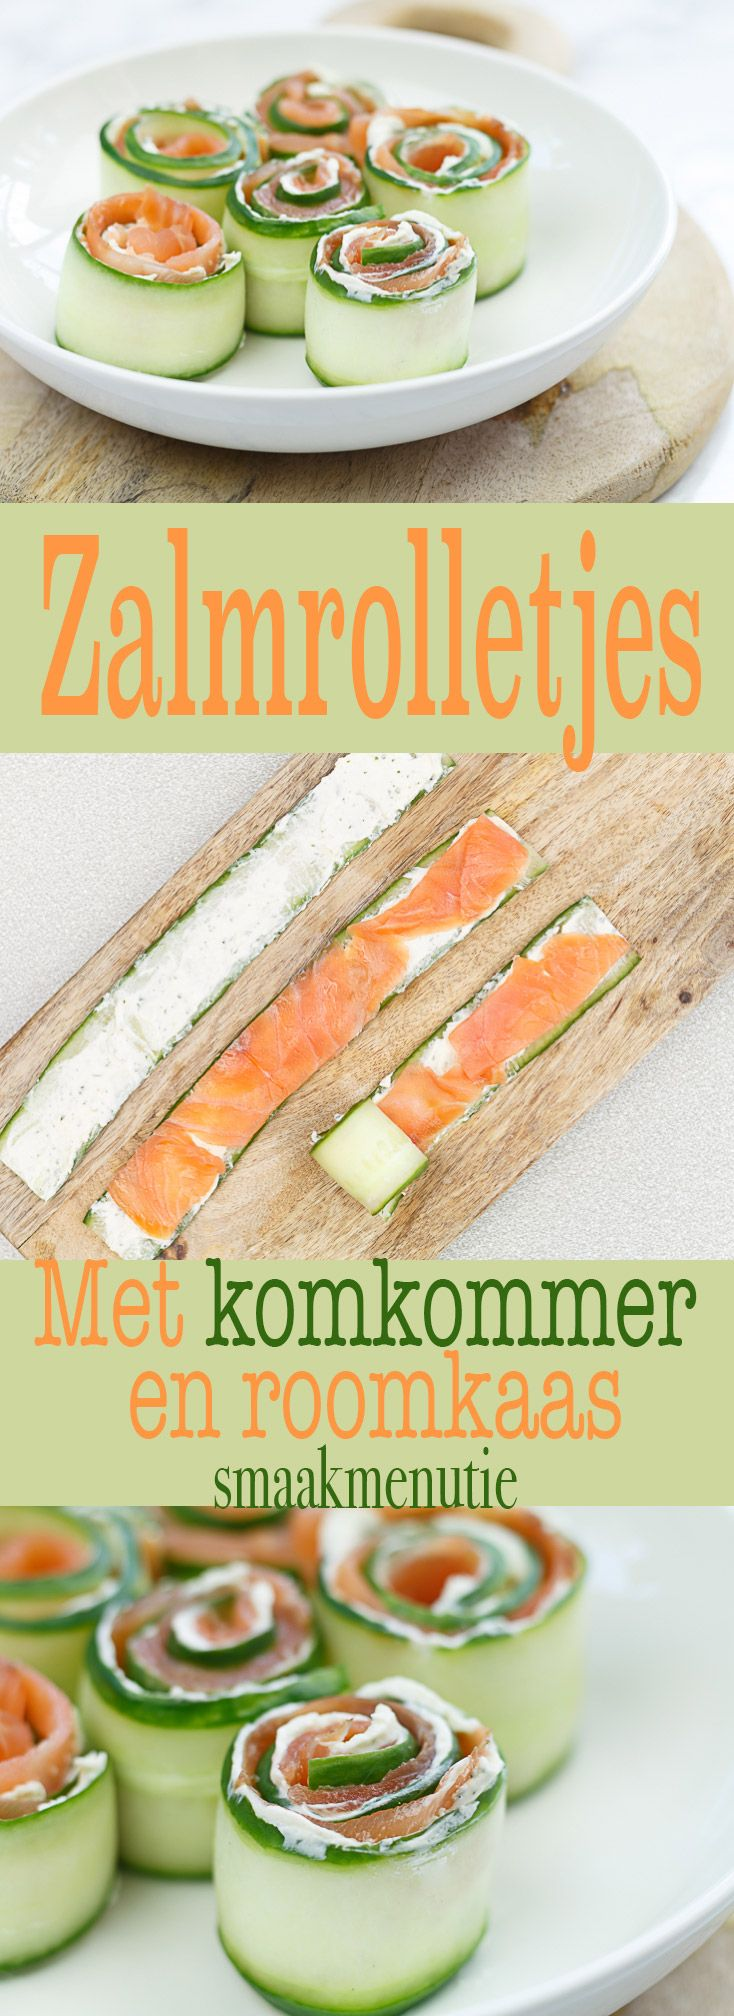 Zalmrolletjes met komkommer en roomkaas #recept #recipe #zalm #borrelhapjes #aperitivo #salmon